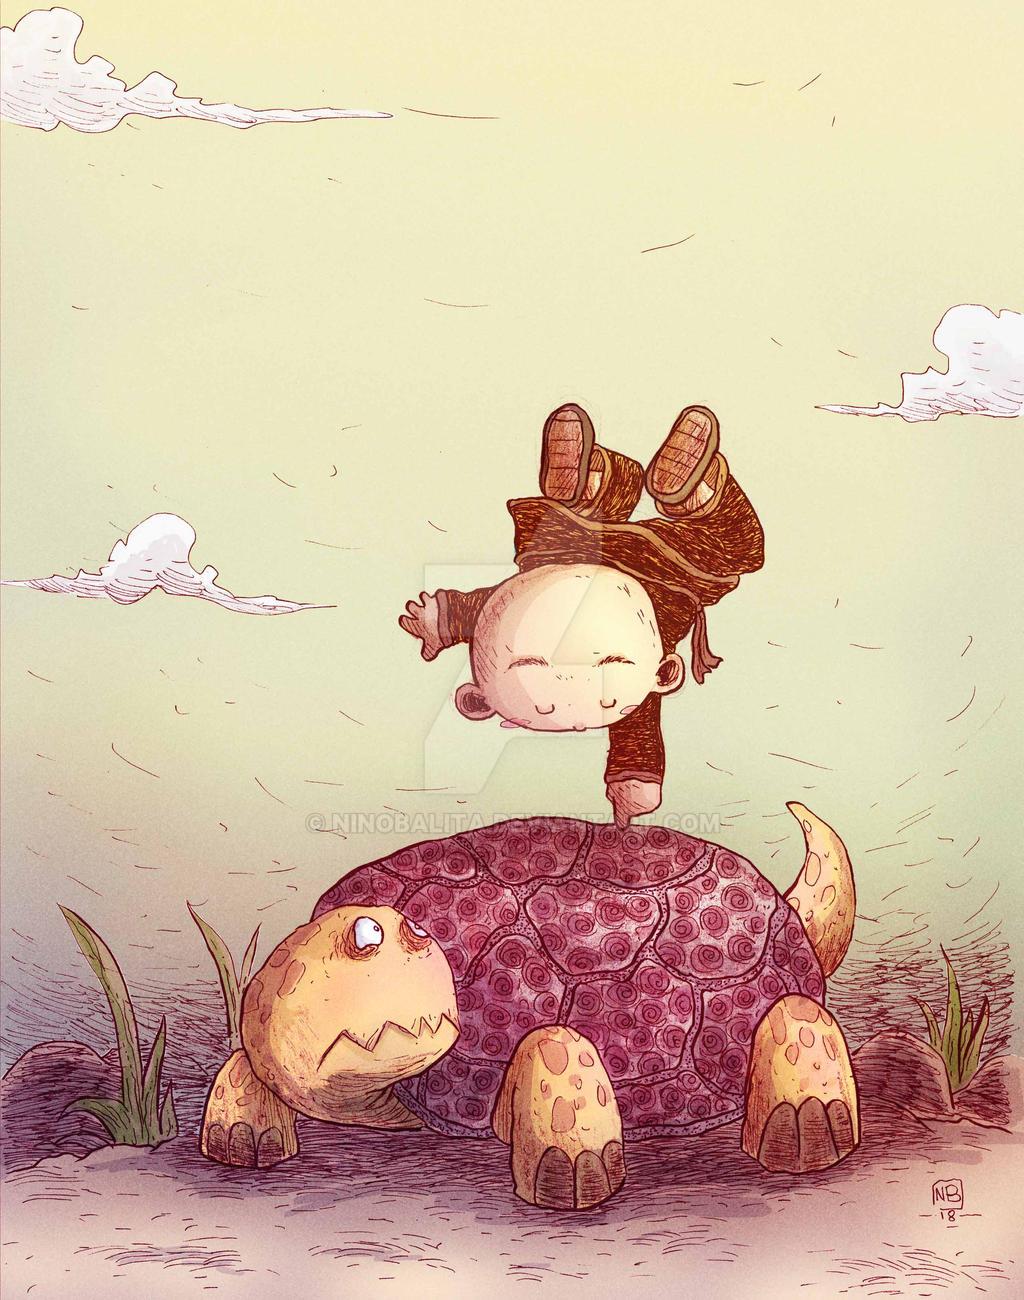 Zen with the Tortoise